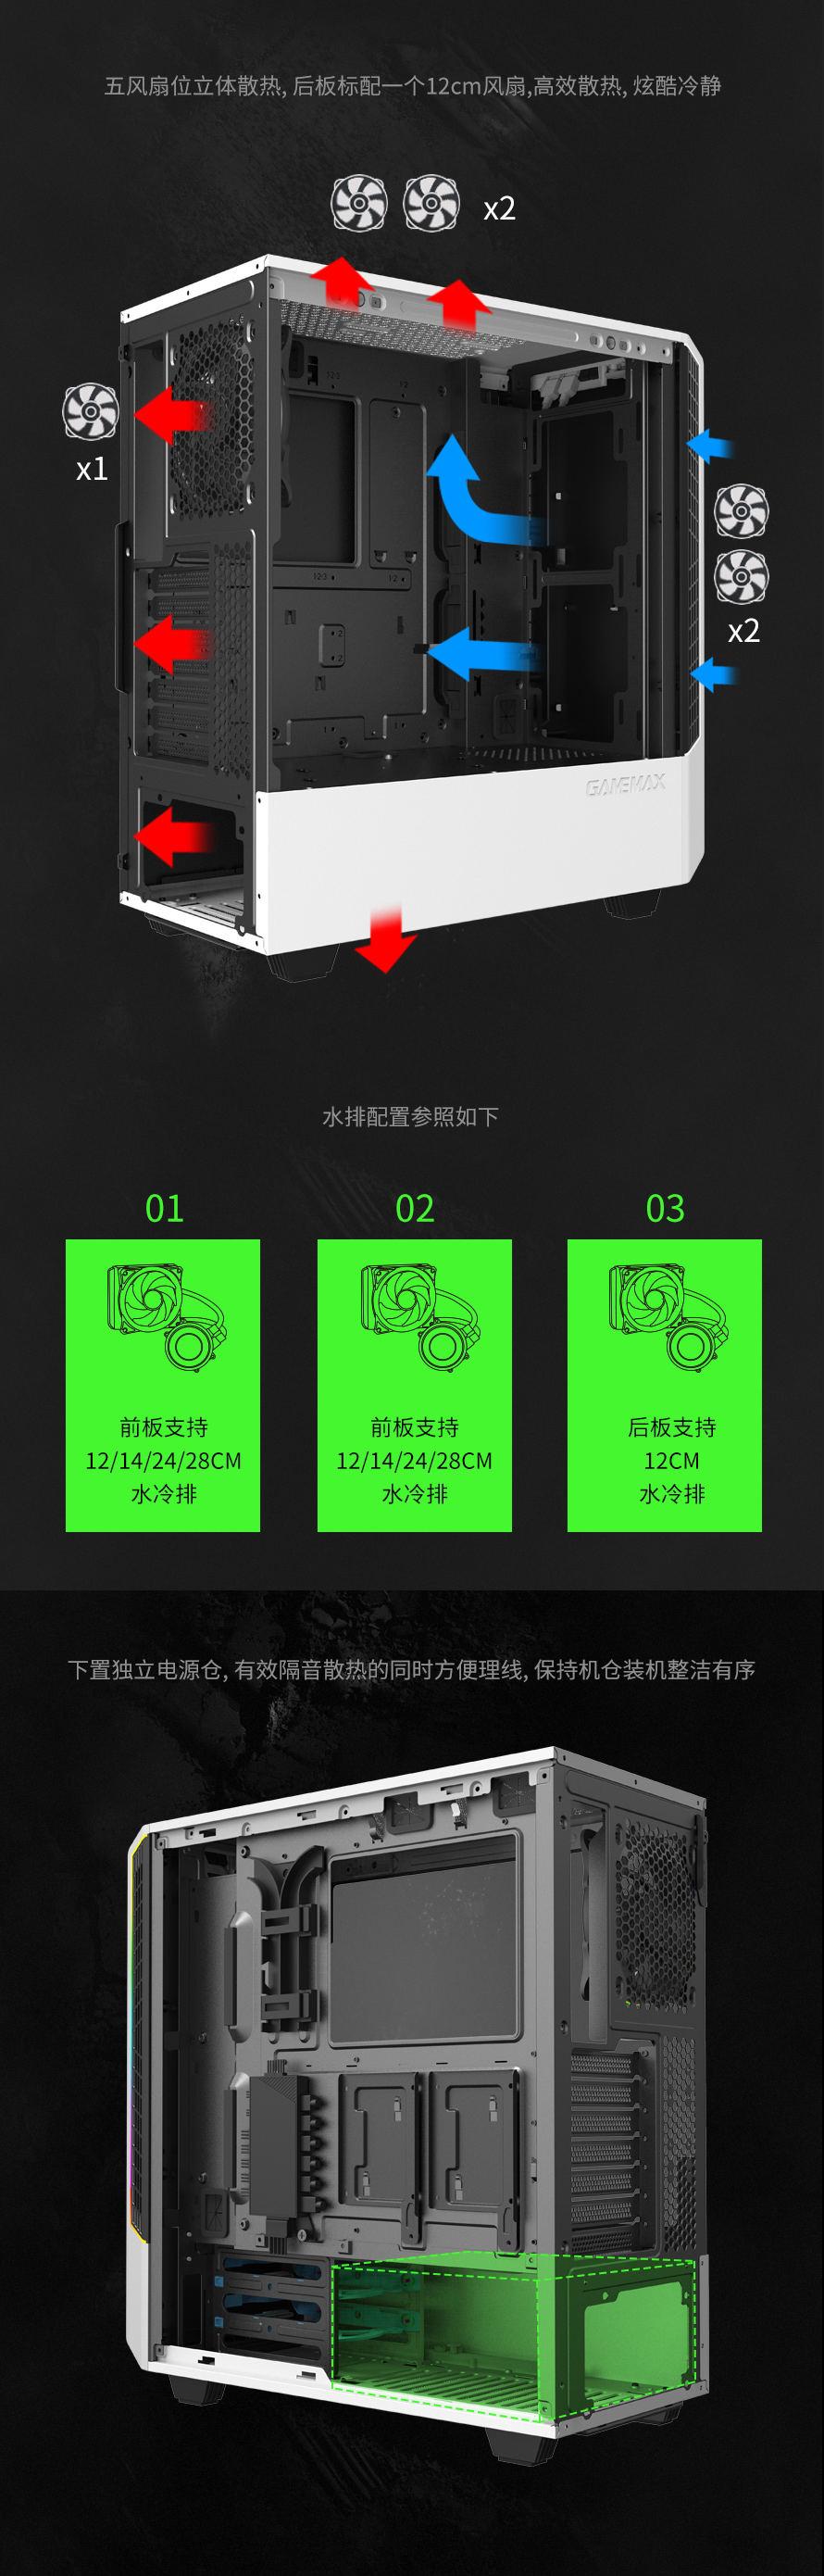 T802_Panda详情页中文_看图王2_04.jpg